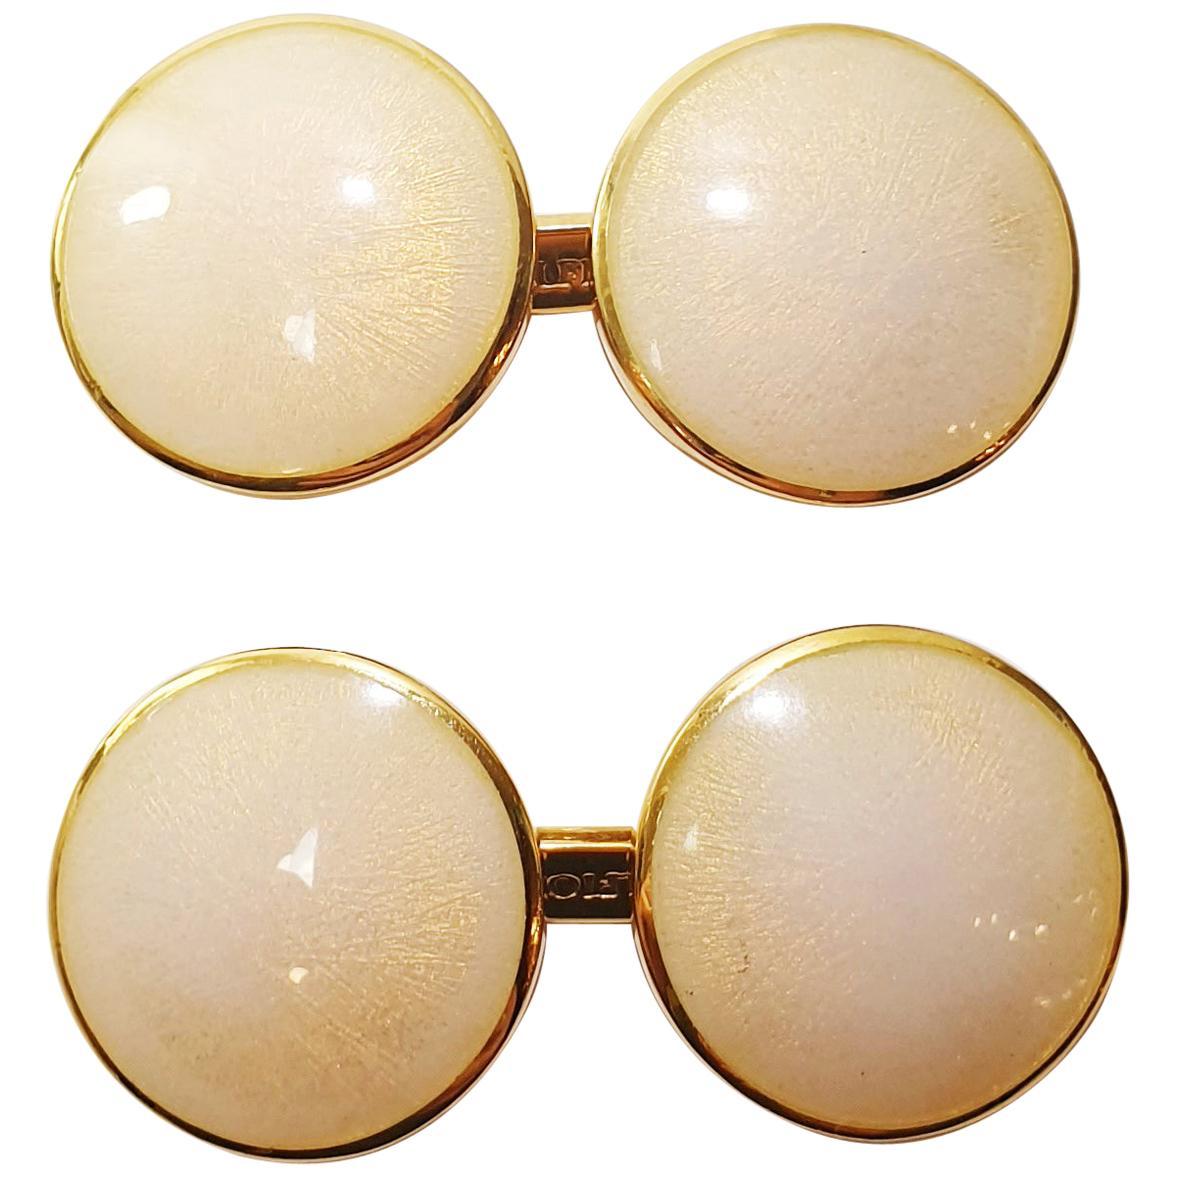 Belfiore Florentine Jewellers 18 Karat Gold and Enamel Cufflinks